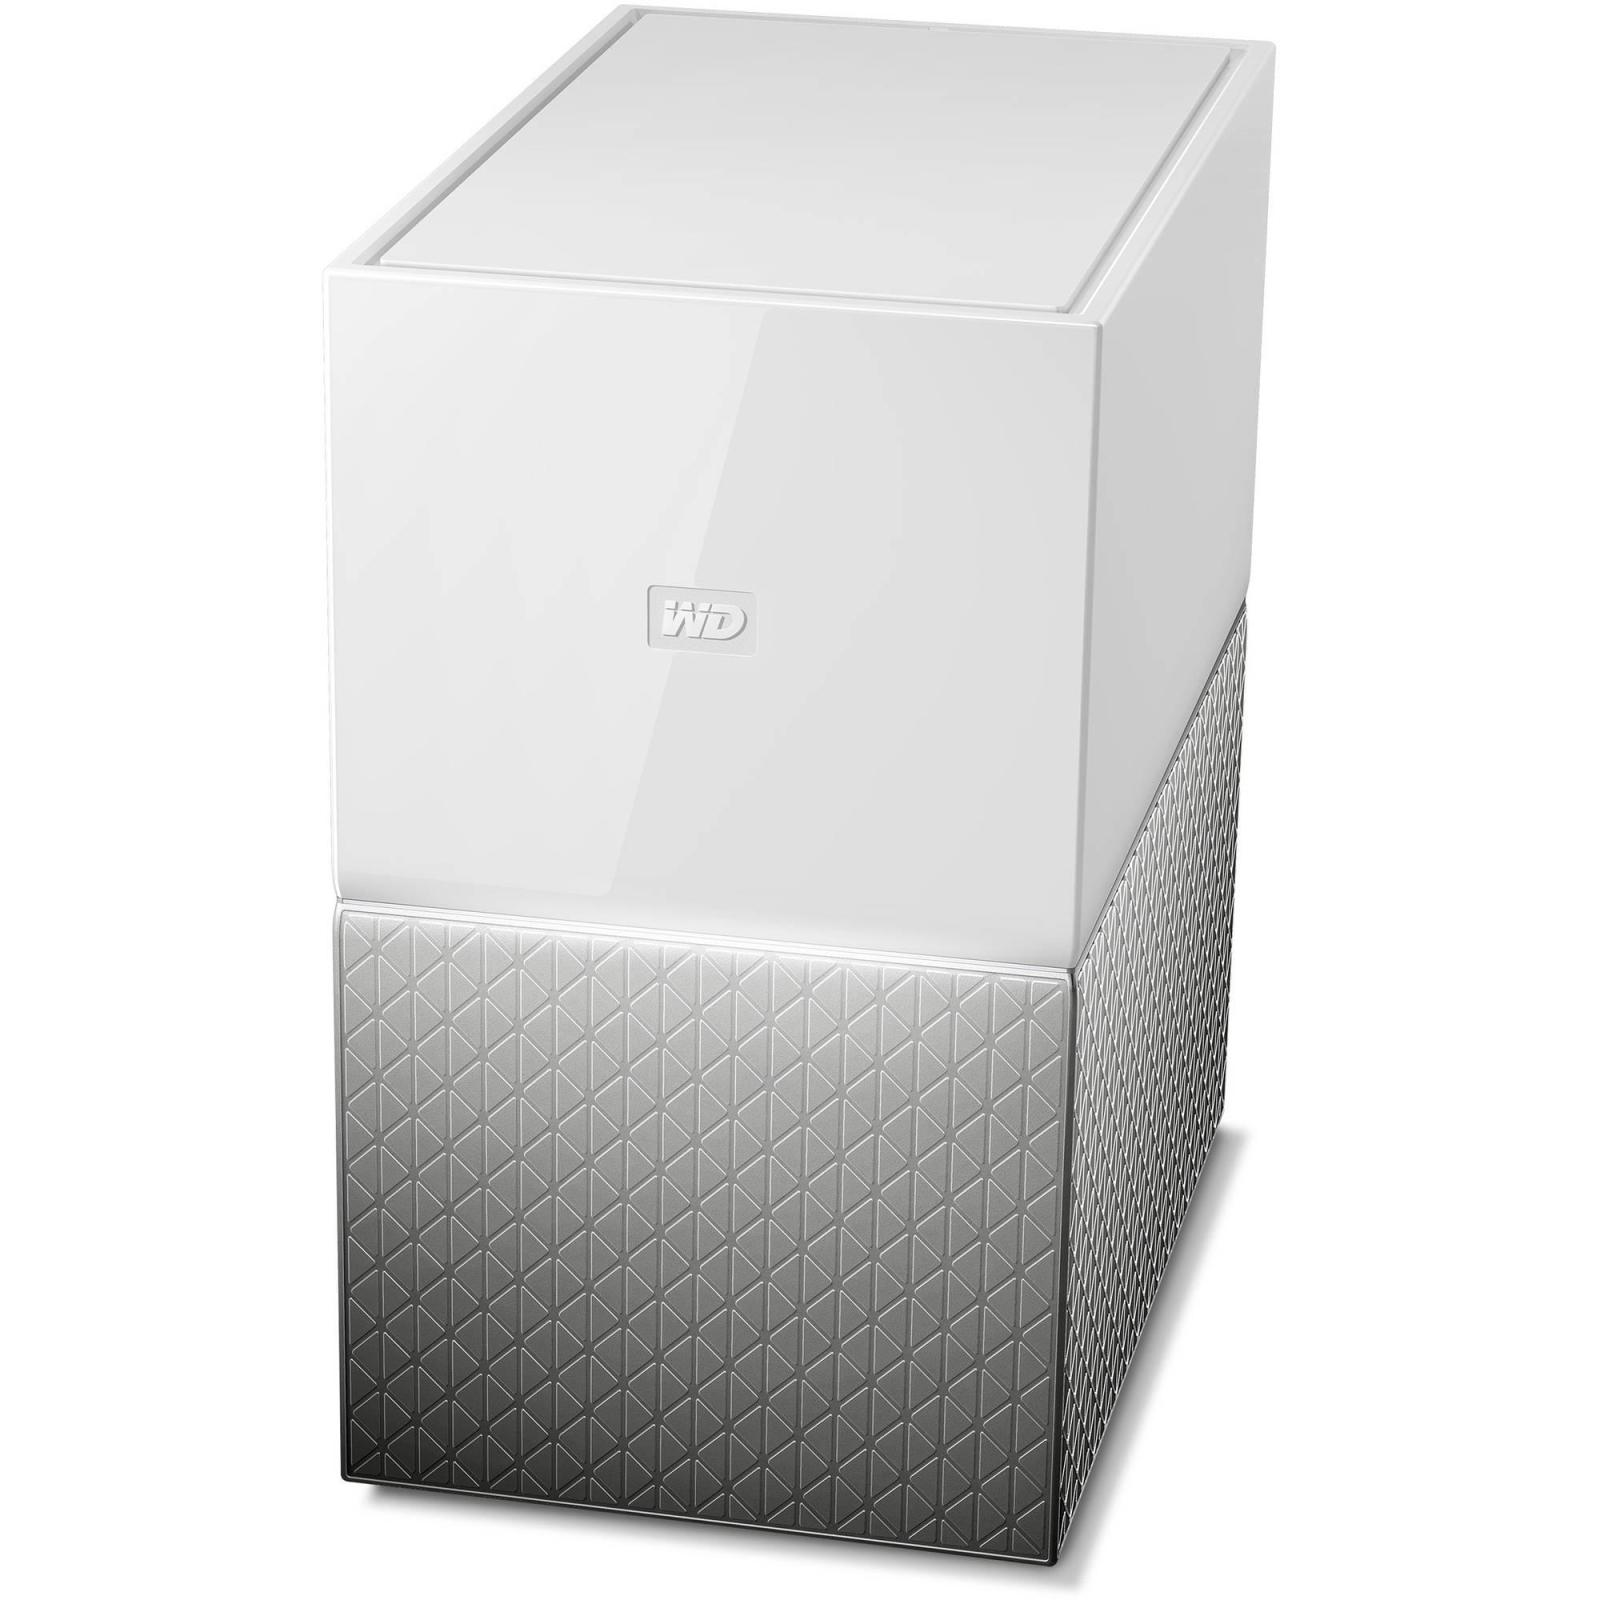 "NAS 3.5"" 6TB My Cloud Home Duo WD (WDBMUT0060JWT-EESN) изображение 3"